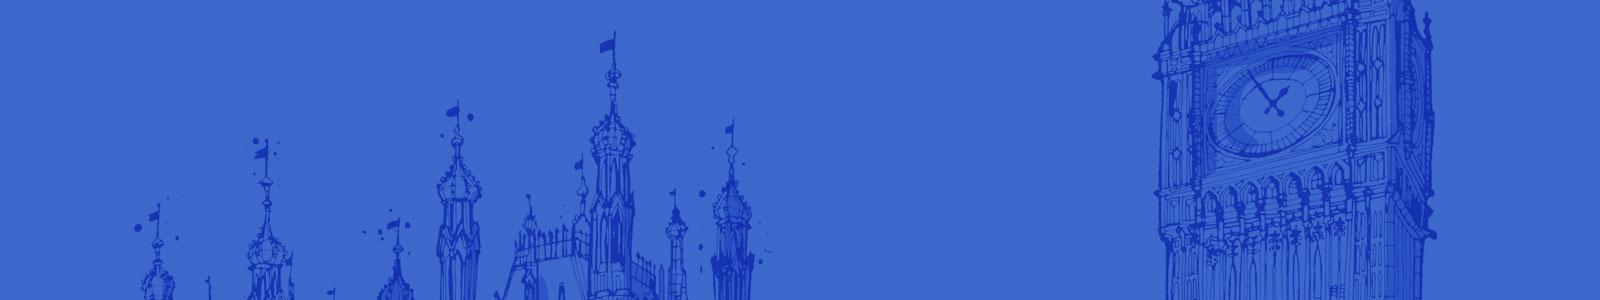 Gartner Data & Analytics Summit 2019